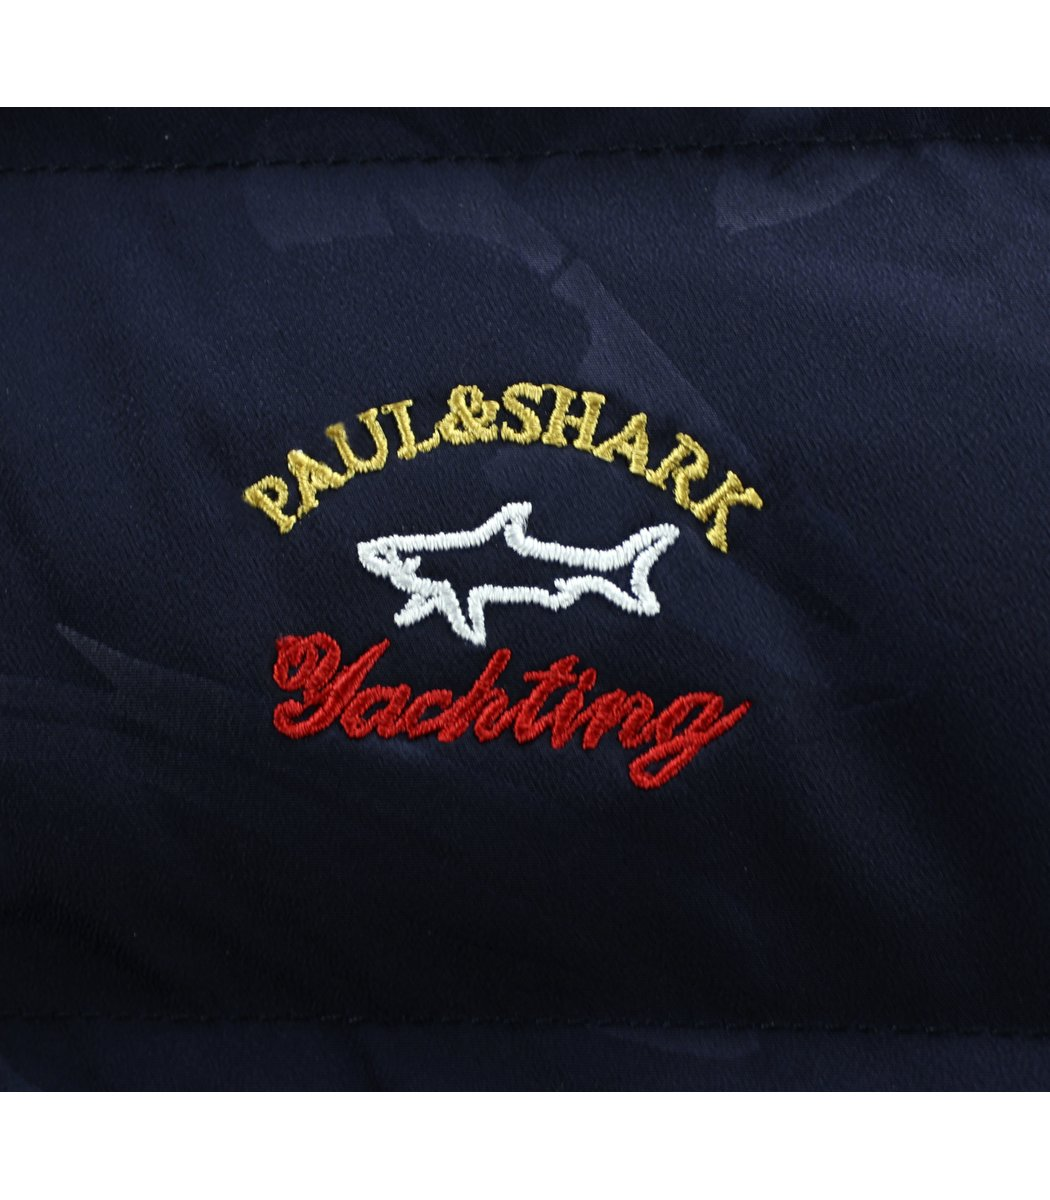 Пуховик  Paul&Shark PS4 Print (Синий)